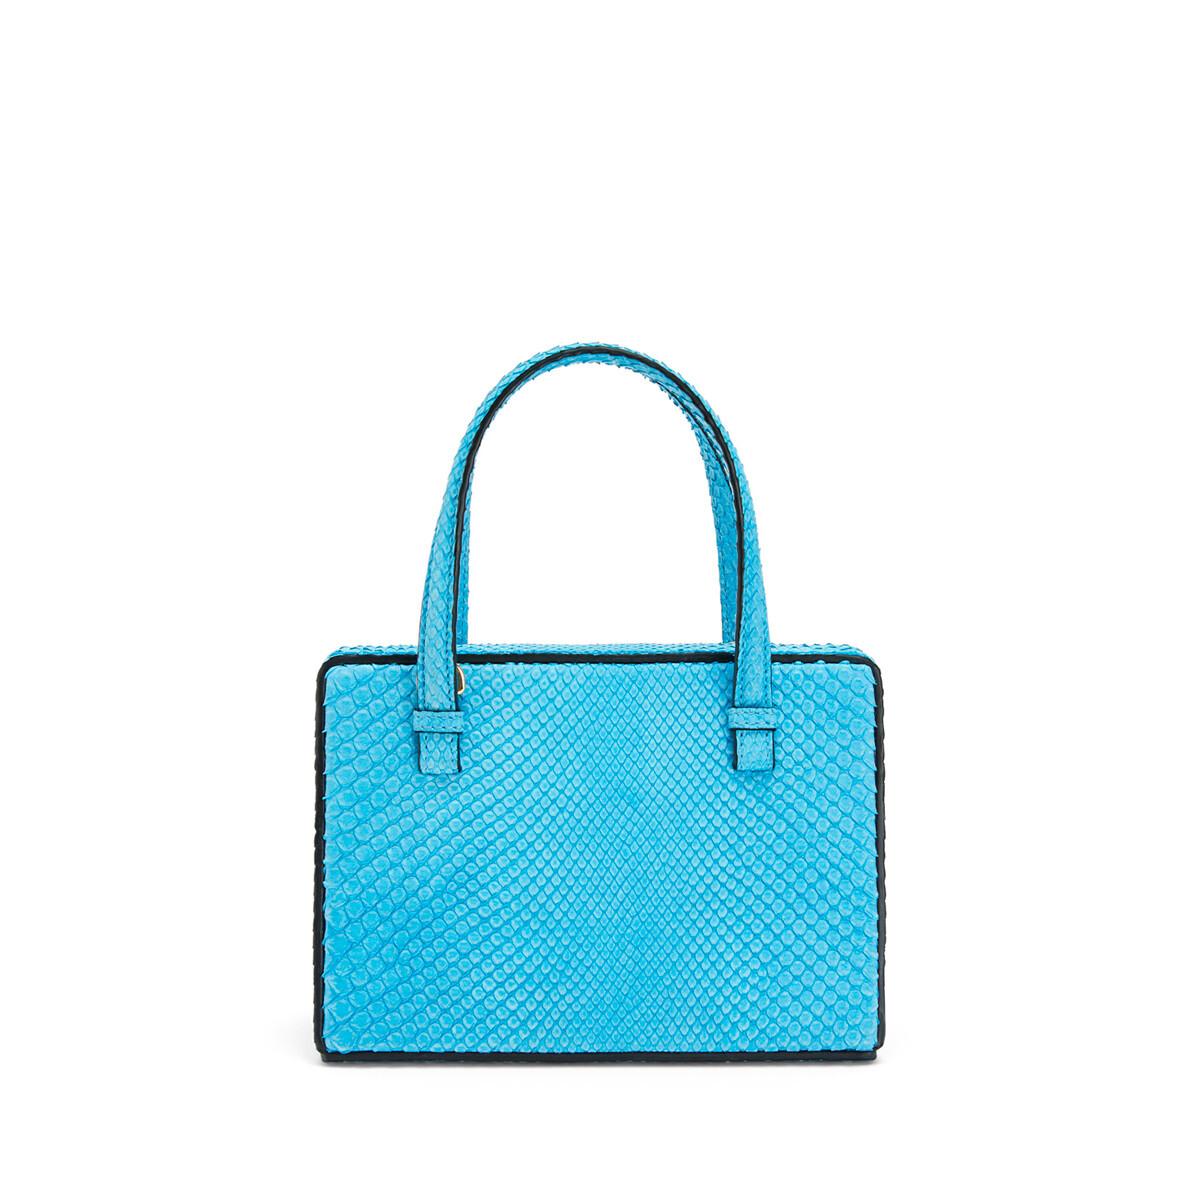 LOEWE Postal Small Bag Sky Blue front